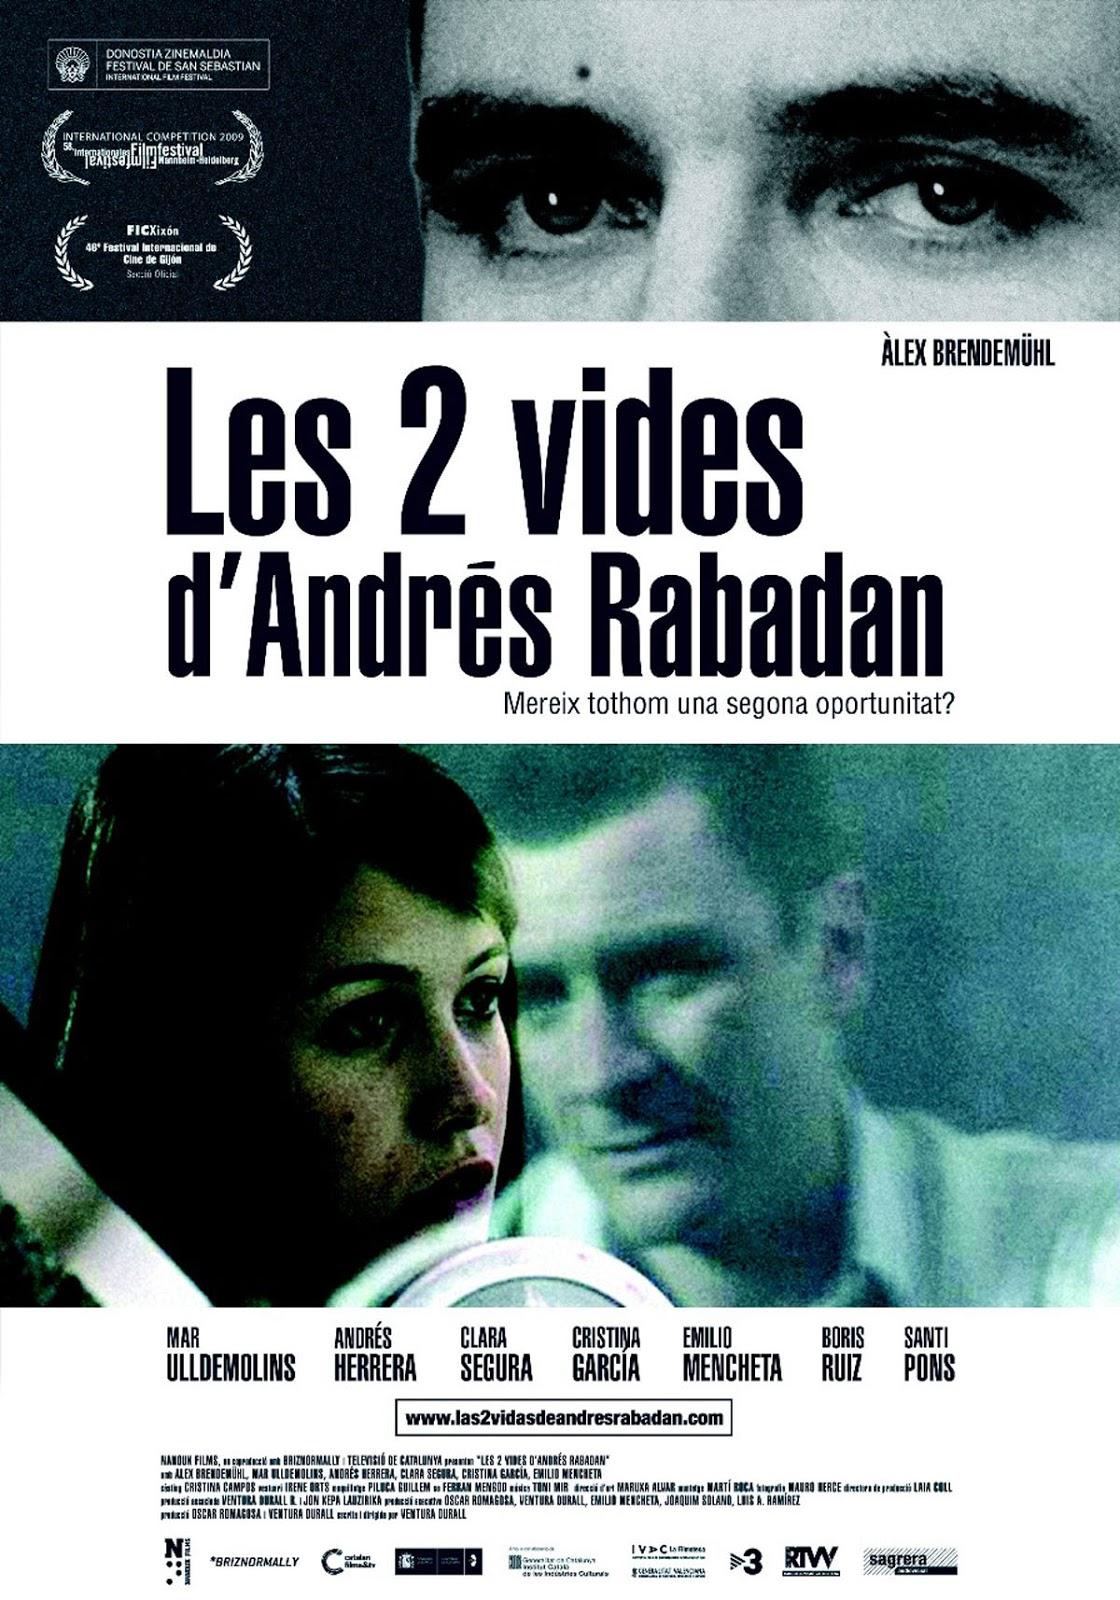 http://descubrepelis.blogspot.com/2012/02/les-2-vides-dandres-rabadan-las-2-vidas.html